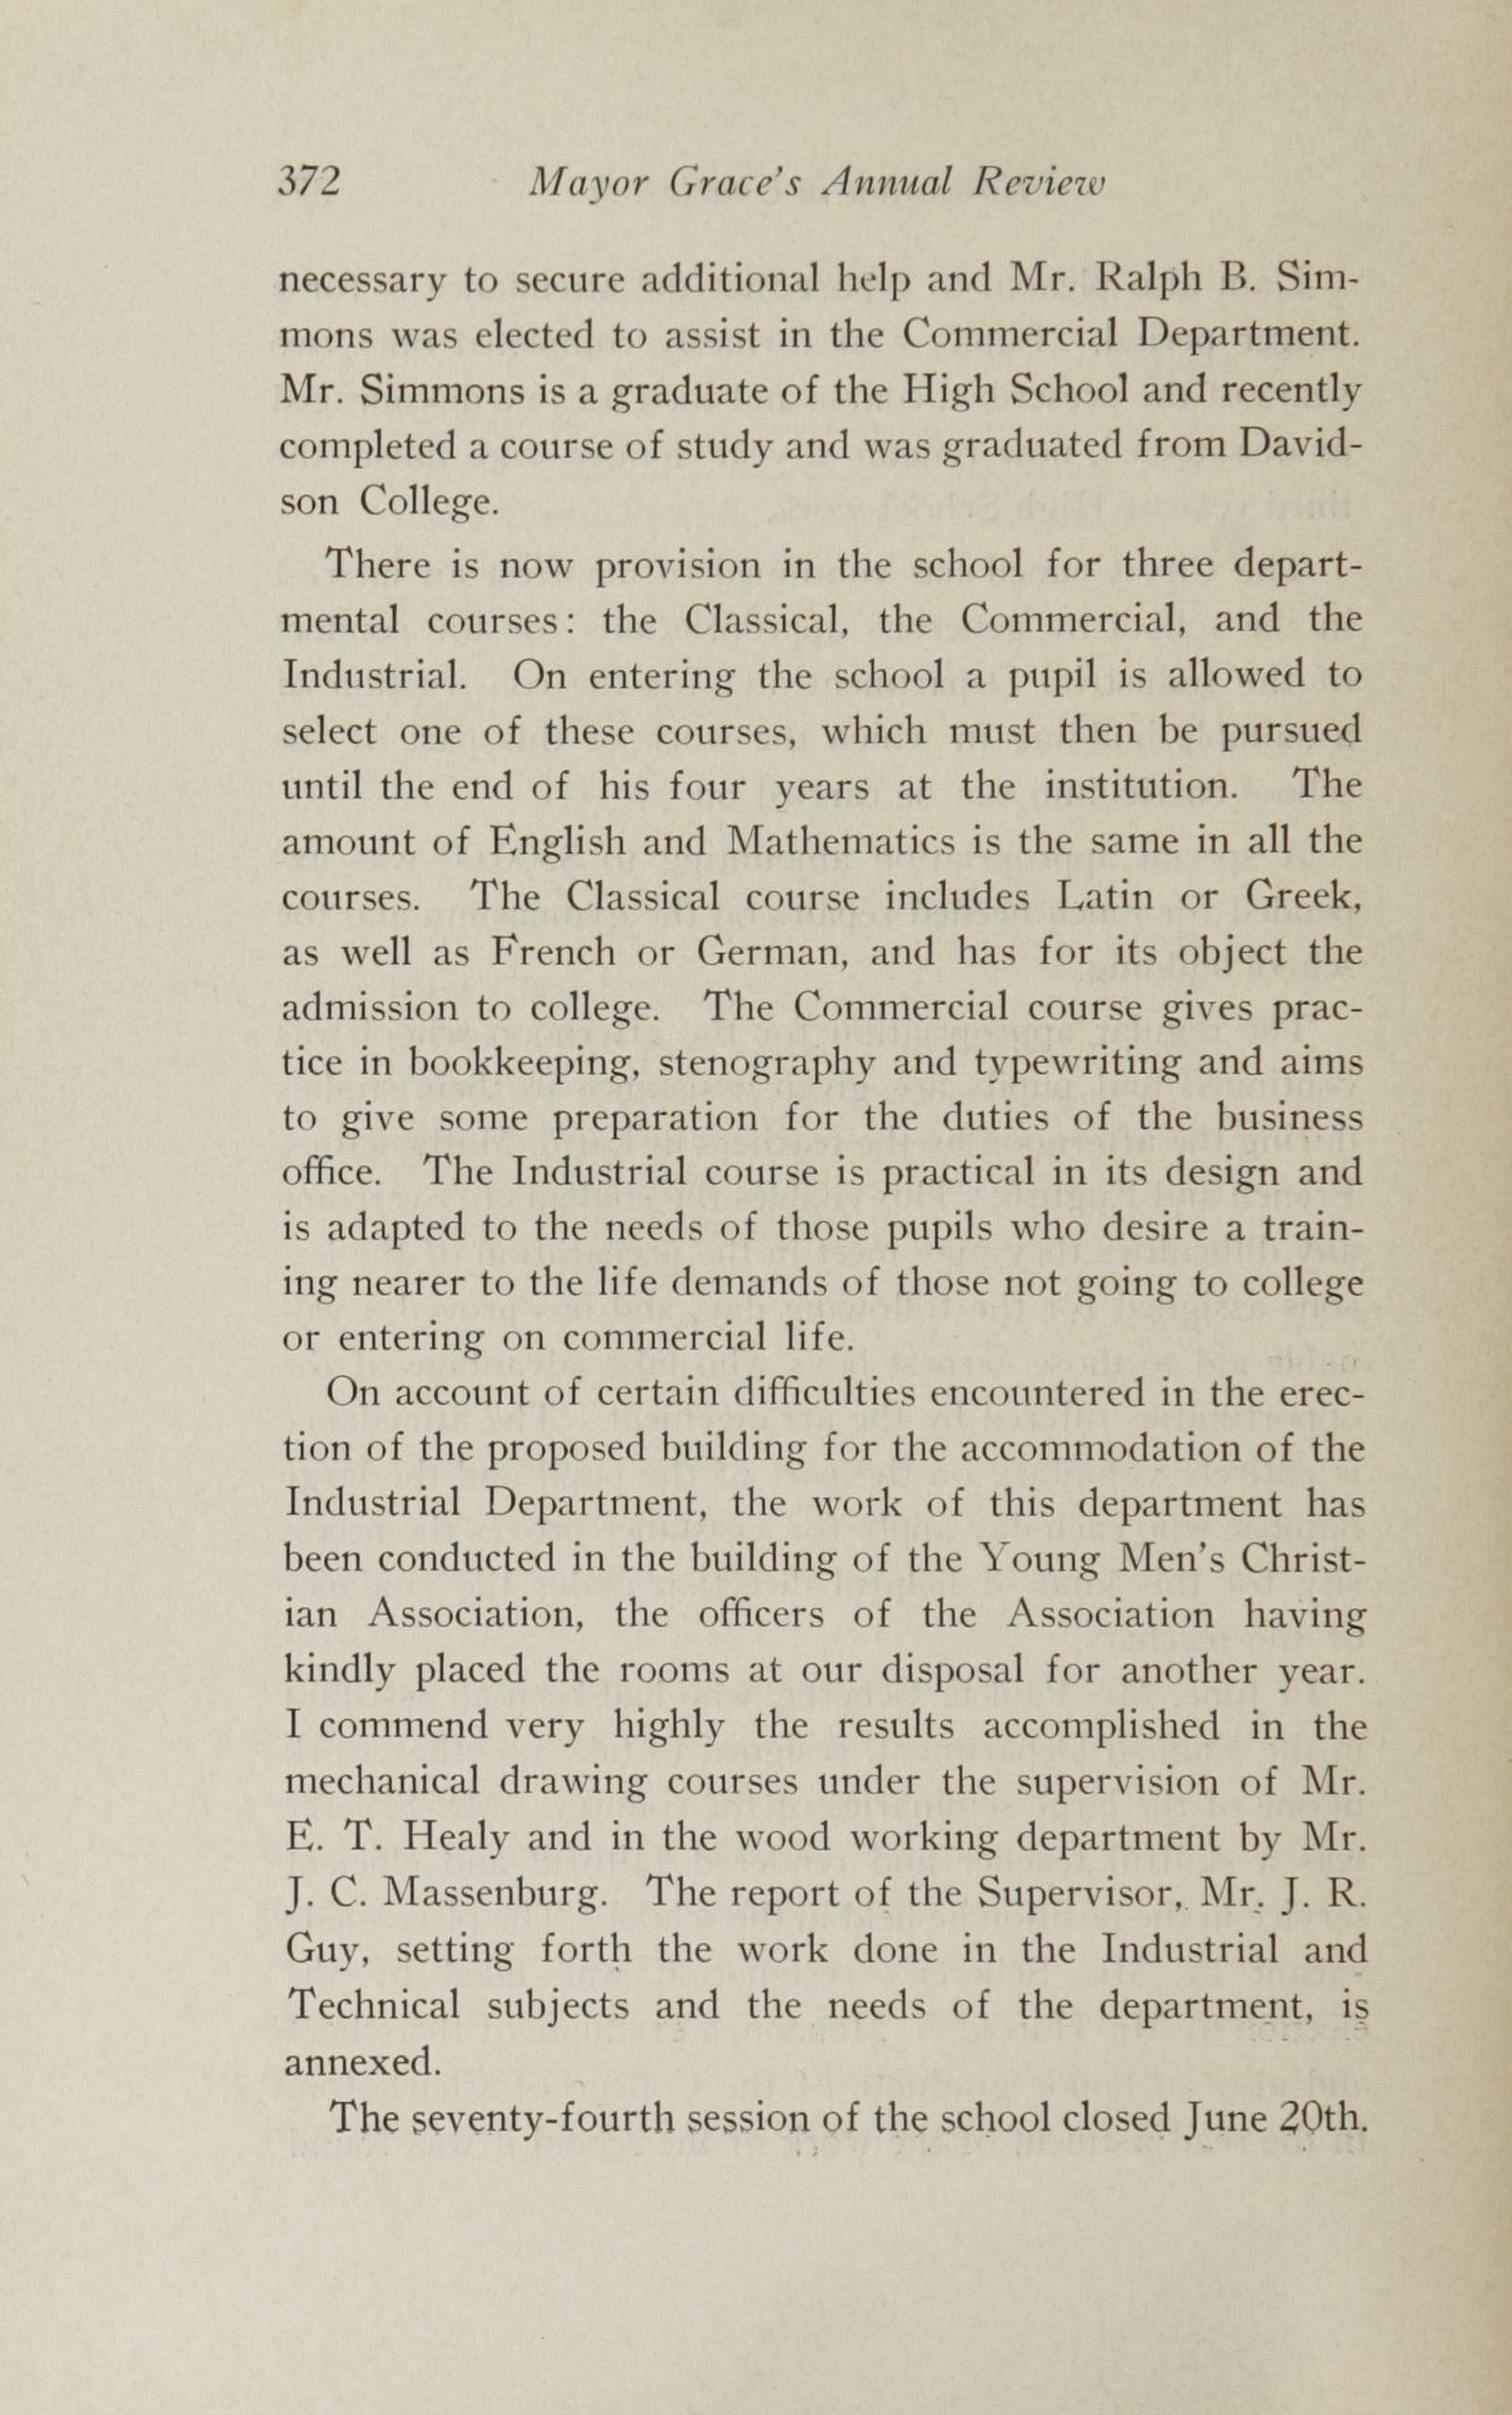 Charleston Yearbook, 1913, page 372